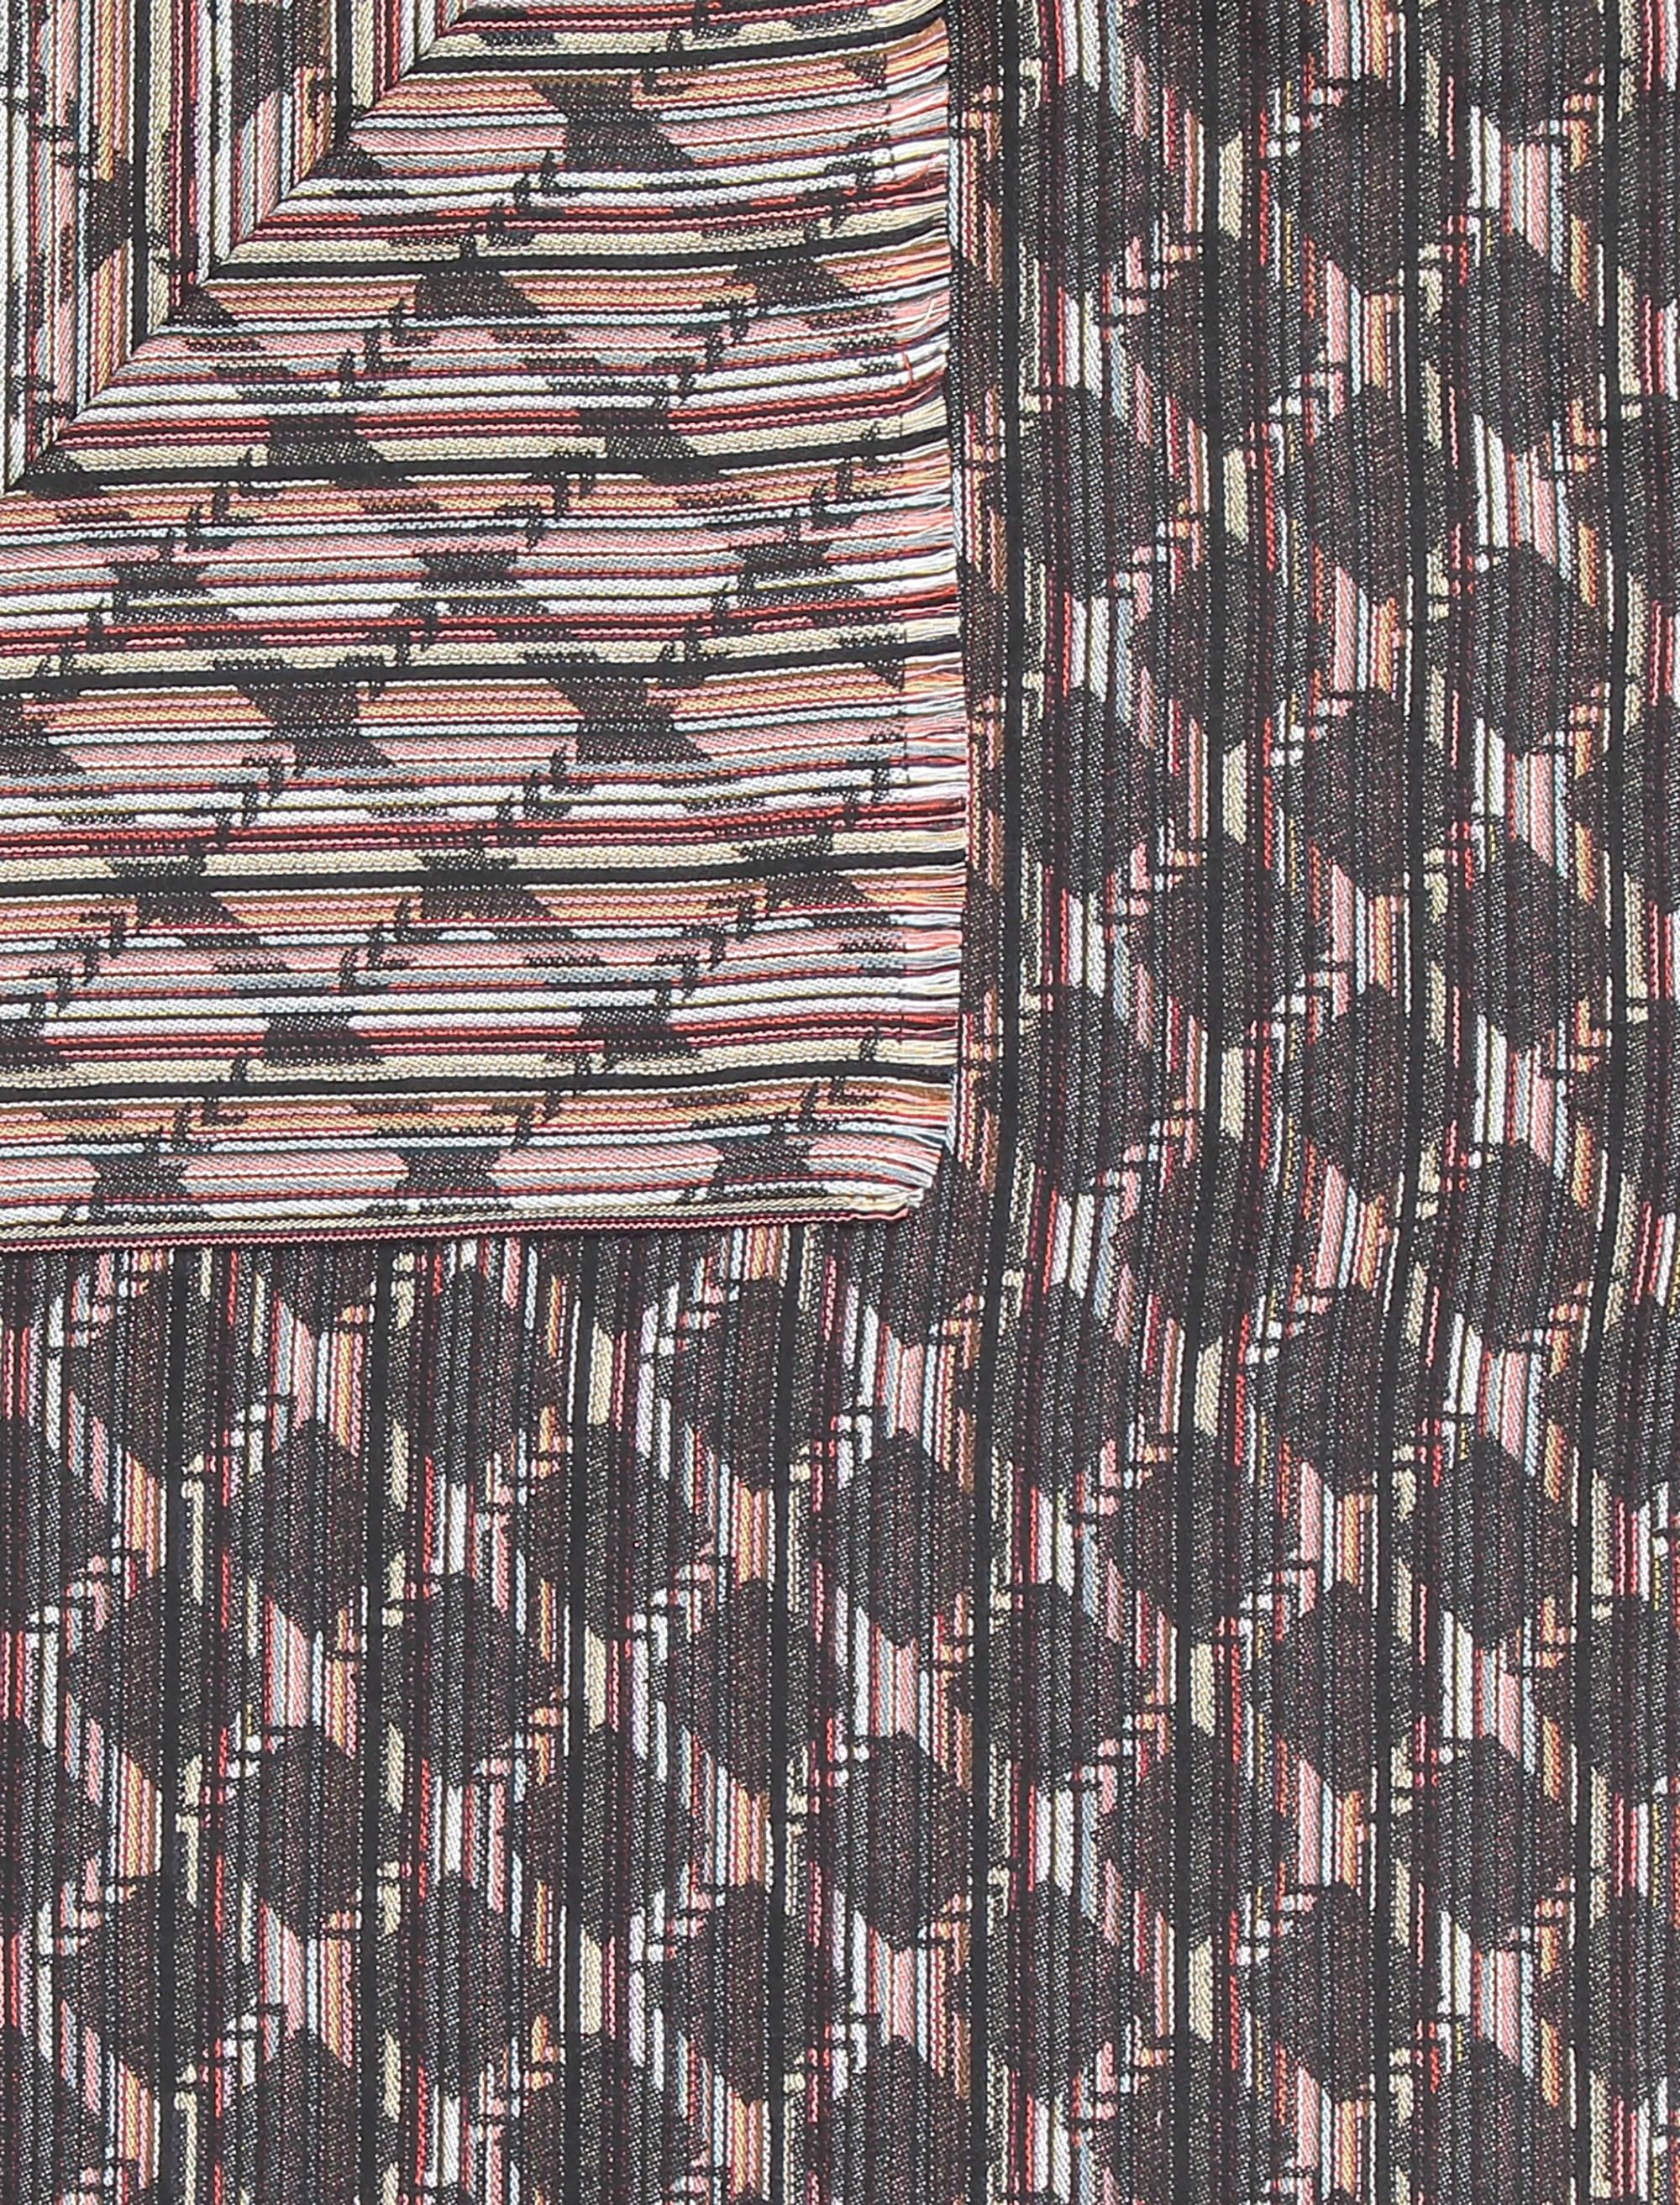 شال نخی طرح دار زنانه - دونابل تک سایز